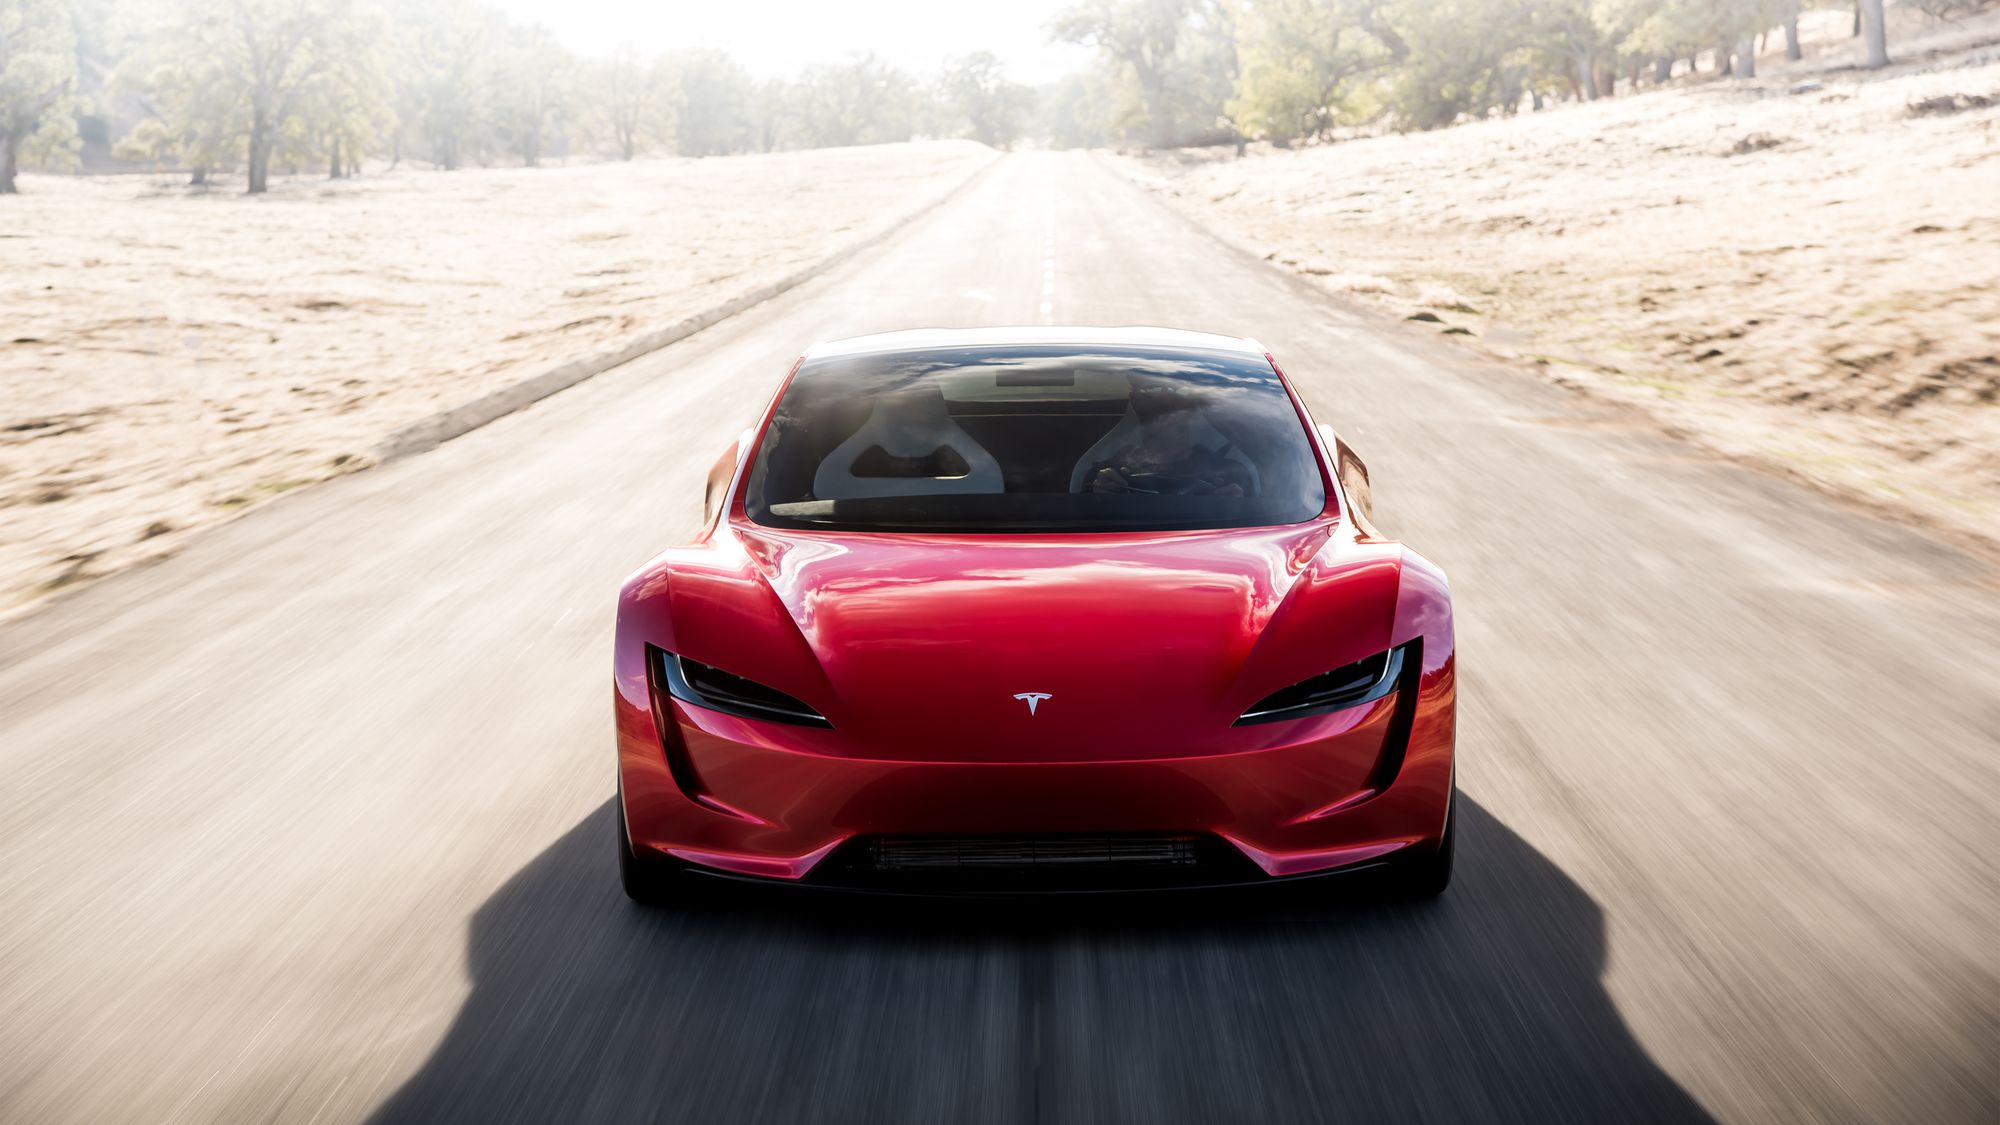 Ščo varto znaty pro novi avtomobili vid Maska — sportkar ta vantaživku Tesla